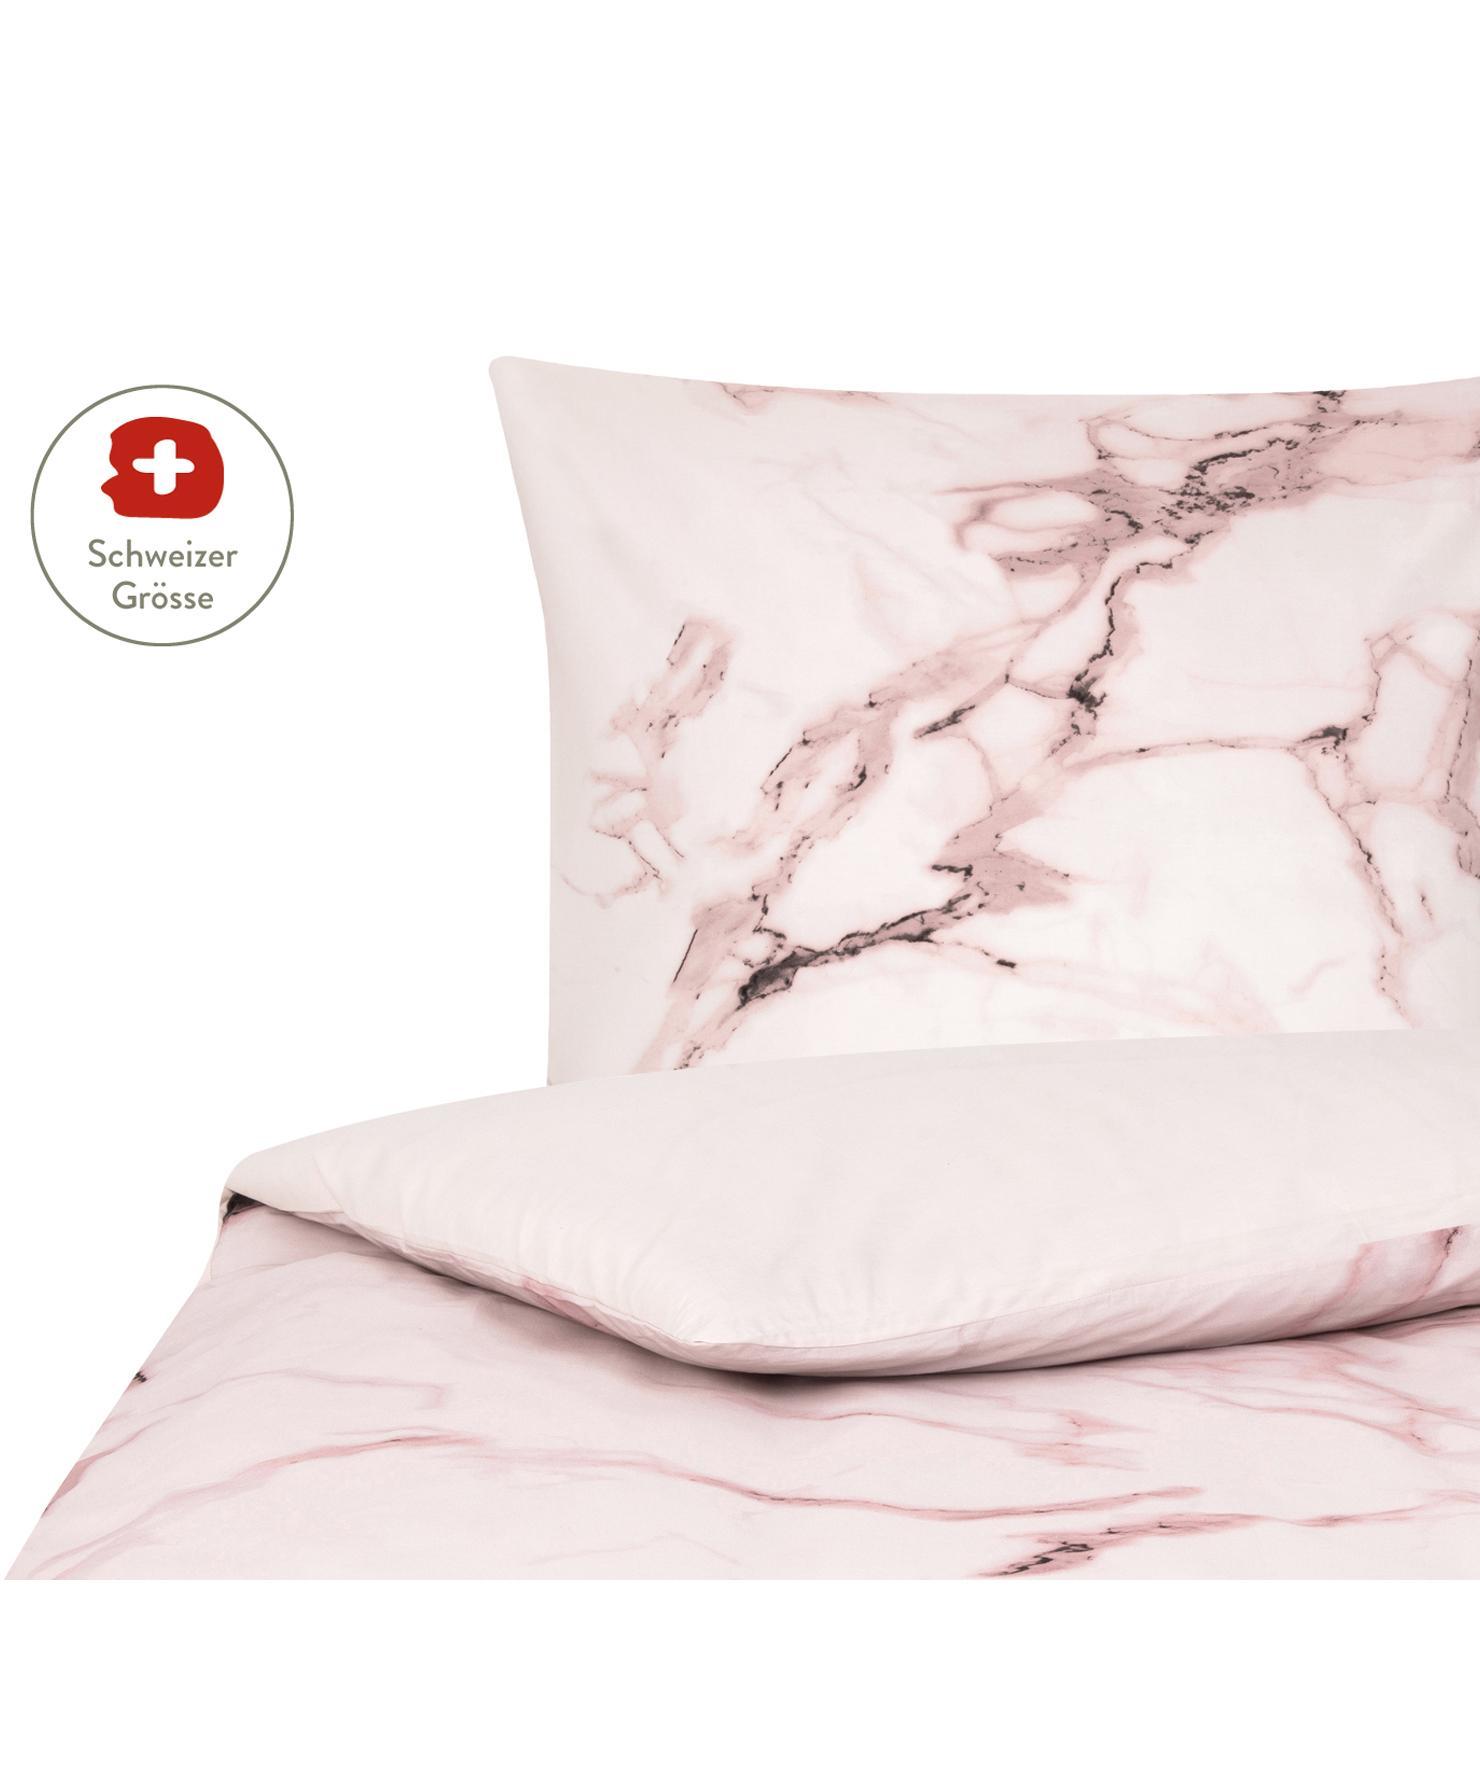 Baumwollperkal-Bettdeckenbezug Malin mit Marmor-Muster, Webart: Renforcé Fadendichte 200 , Vorderseite: Marmormuster, Rosa Rückseite: Rosa, Uni, 160 x 210 cm